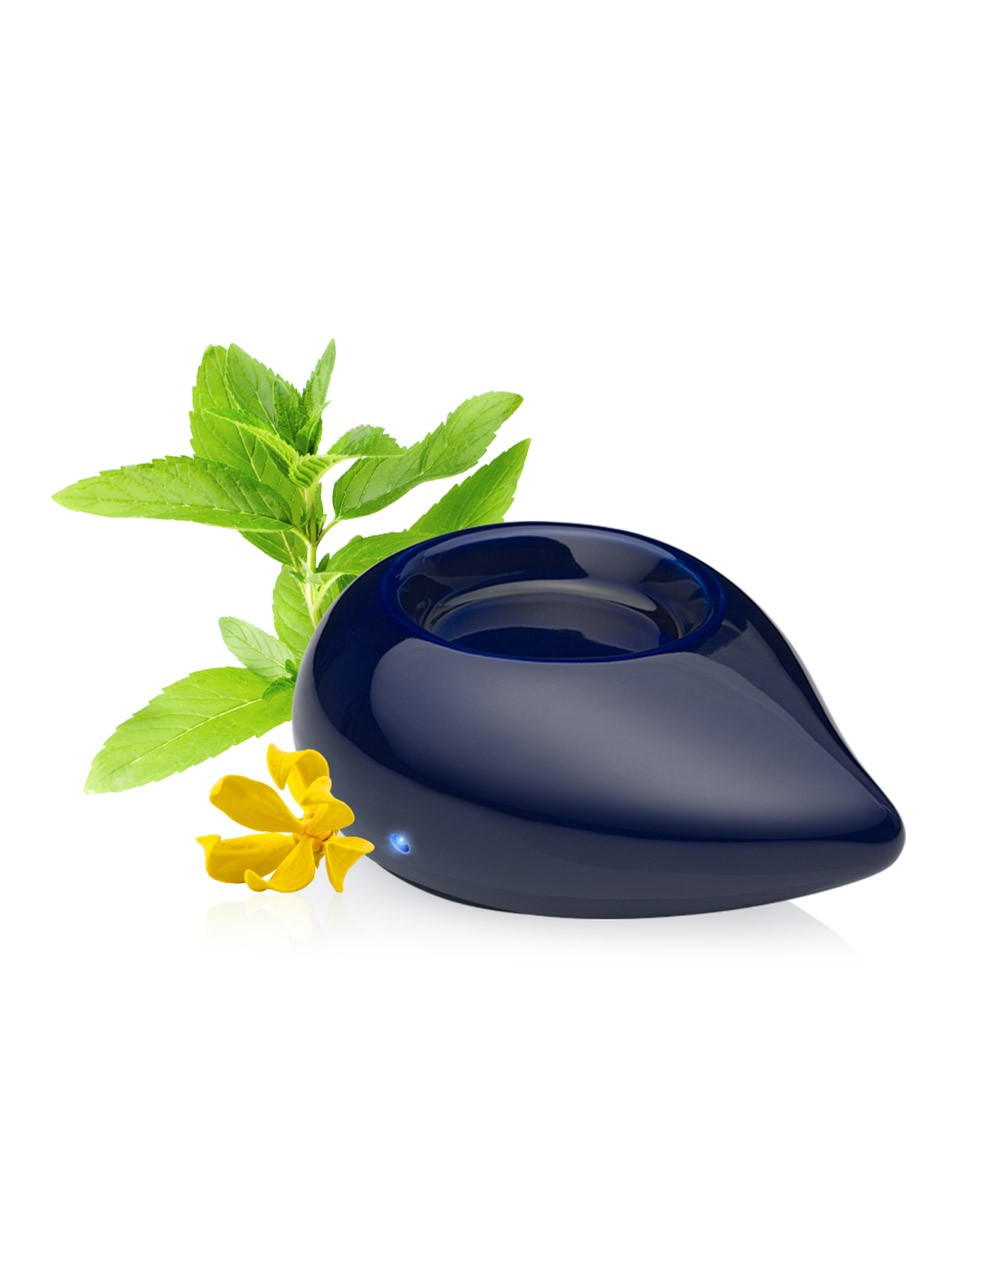 Difusor de aceites esenciales de calor moderado color azúl para aromaterapia